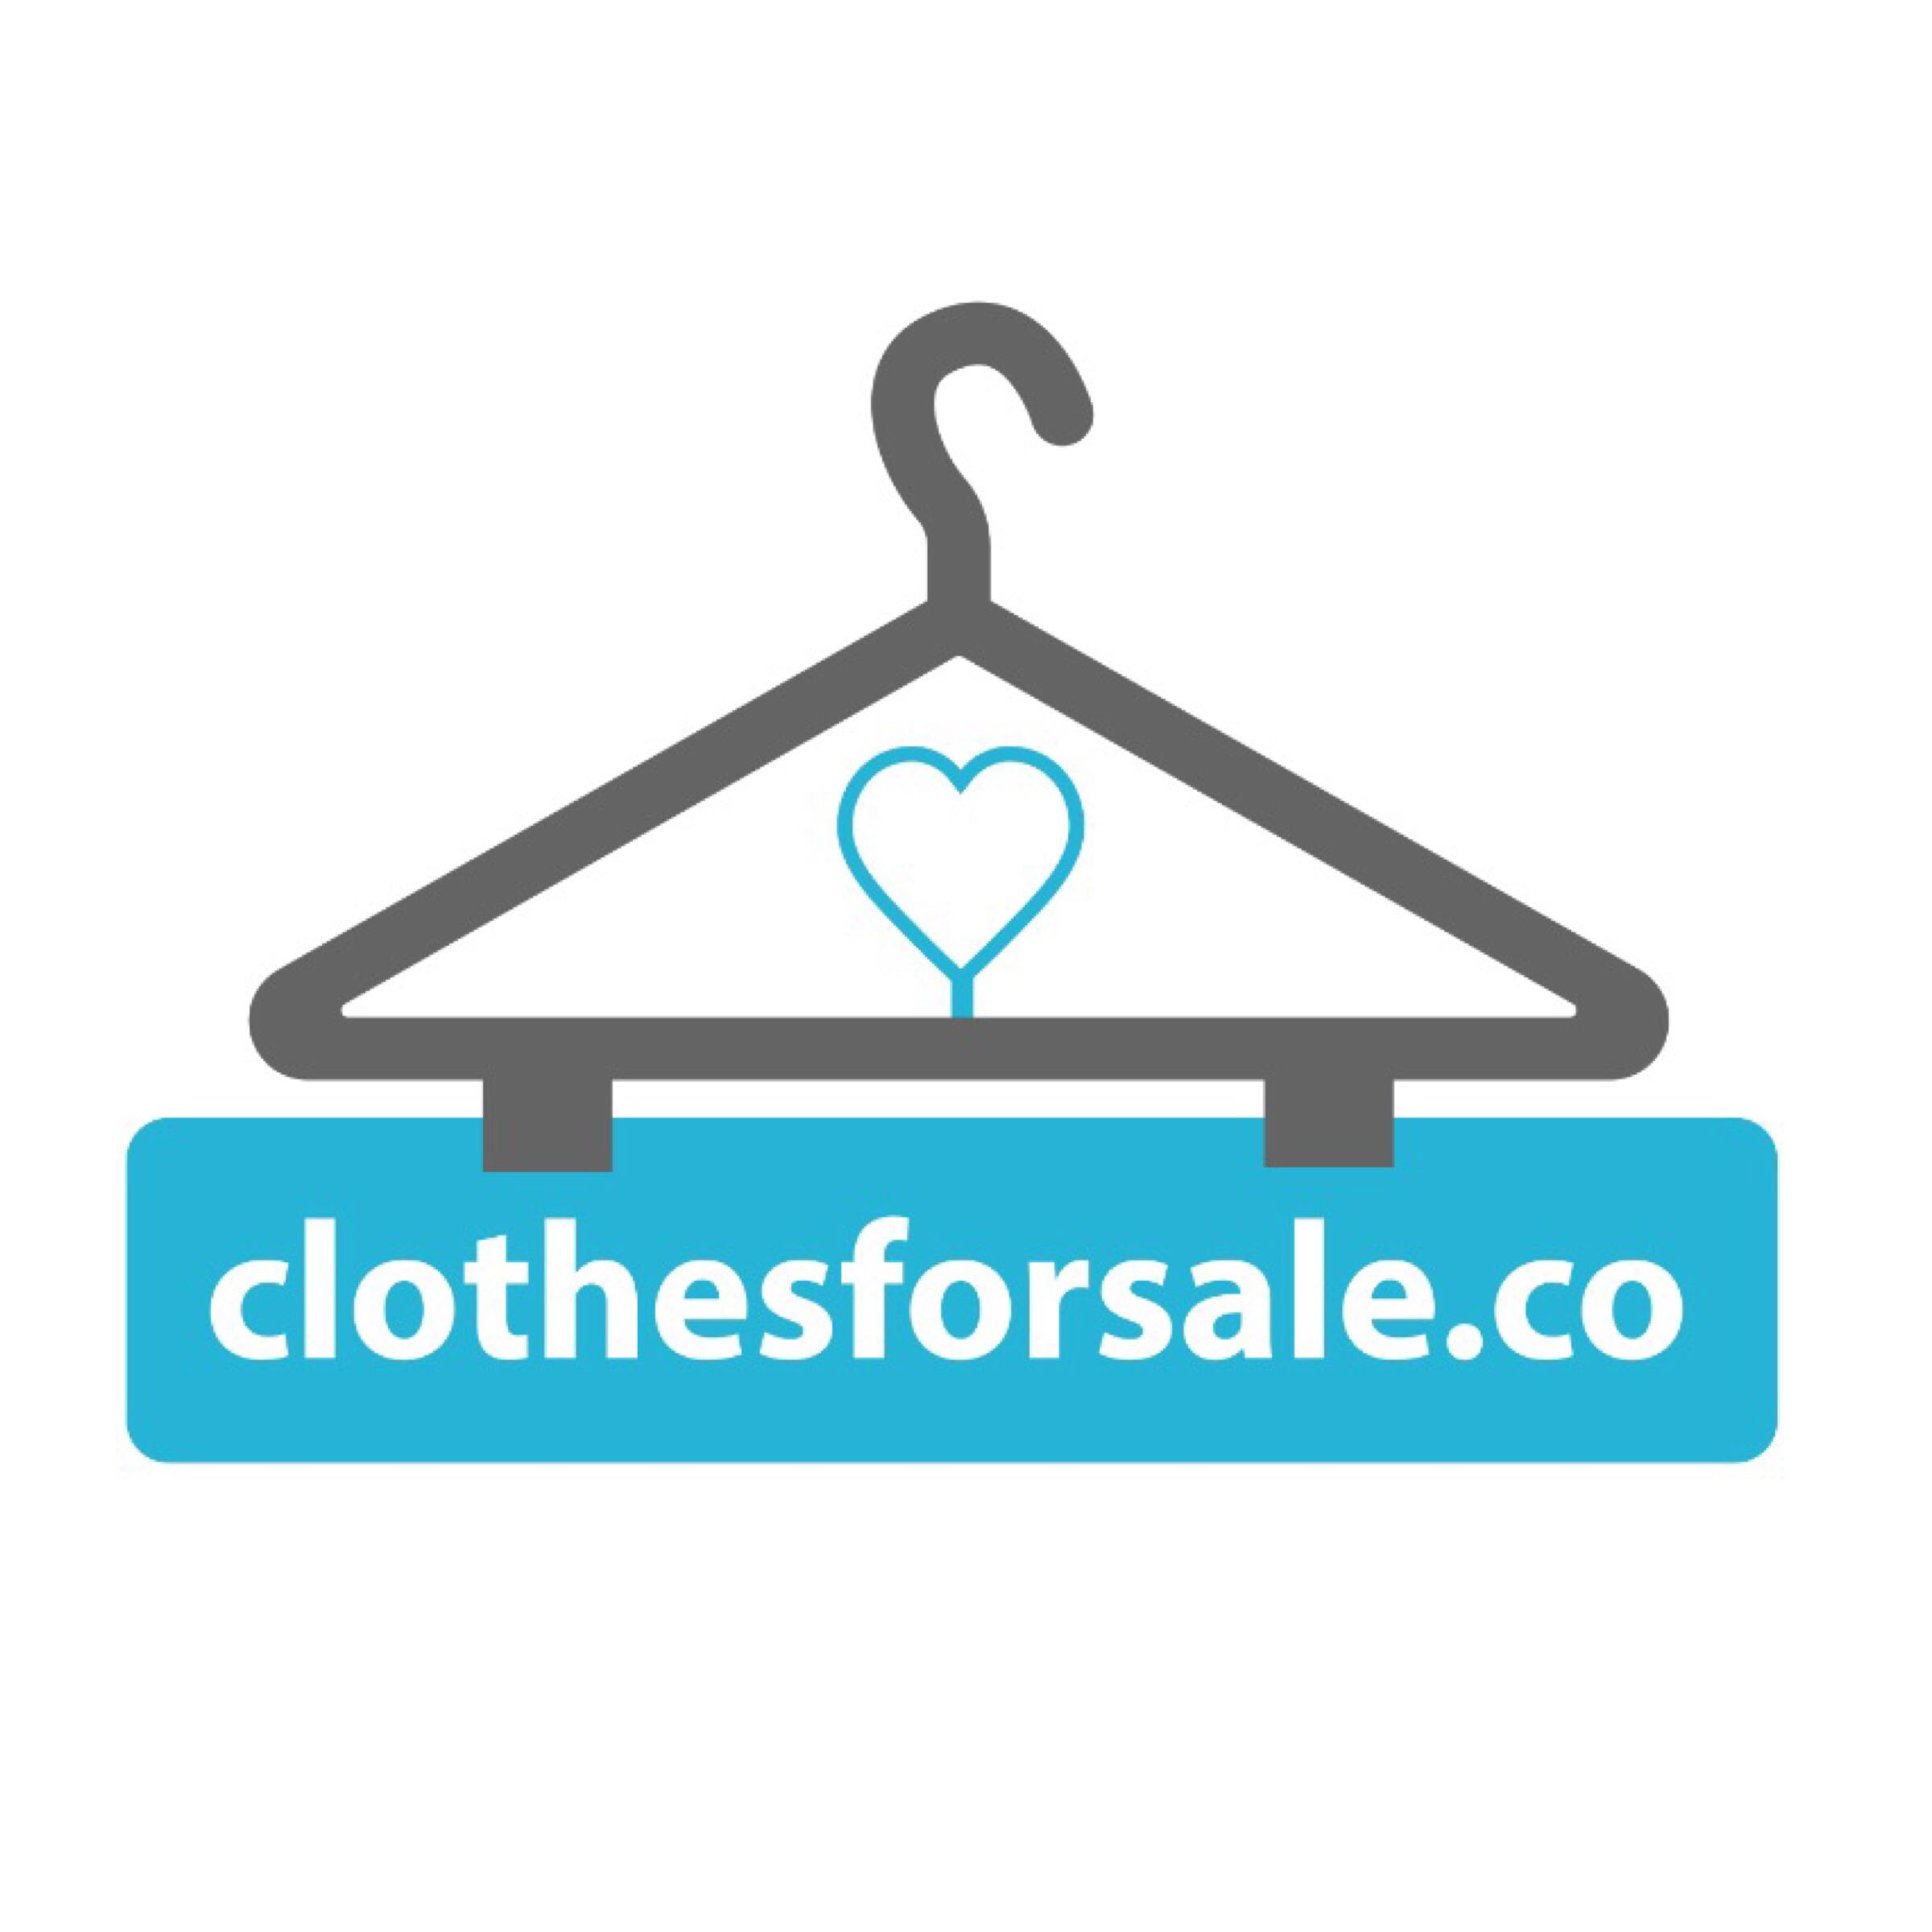 clothesforsale.co